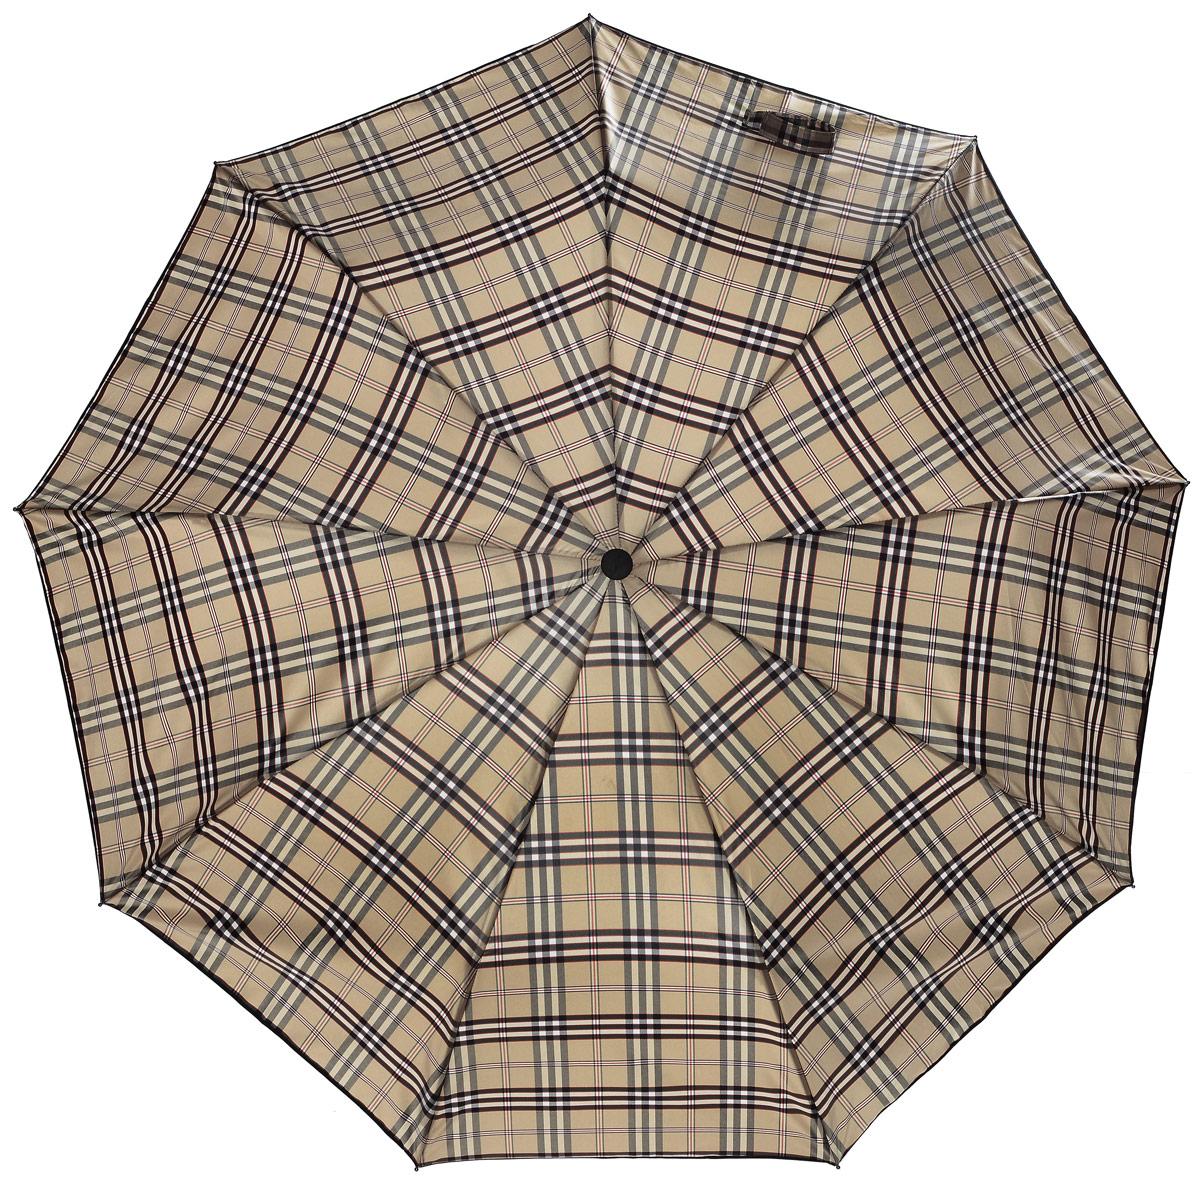 Зонт Sponsa , клетка, цвет: бежево-серый